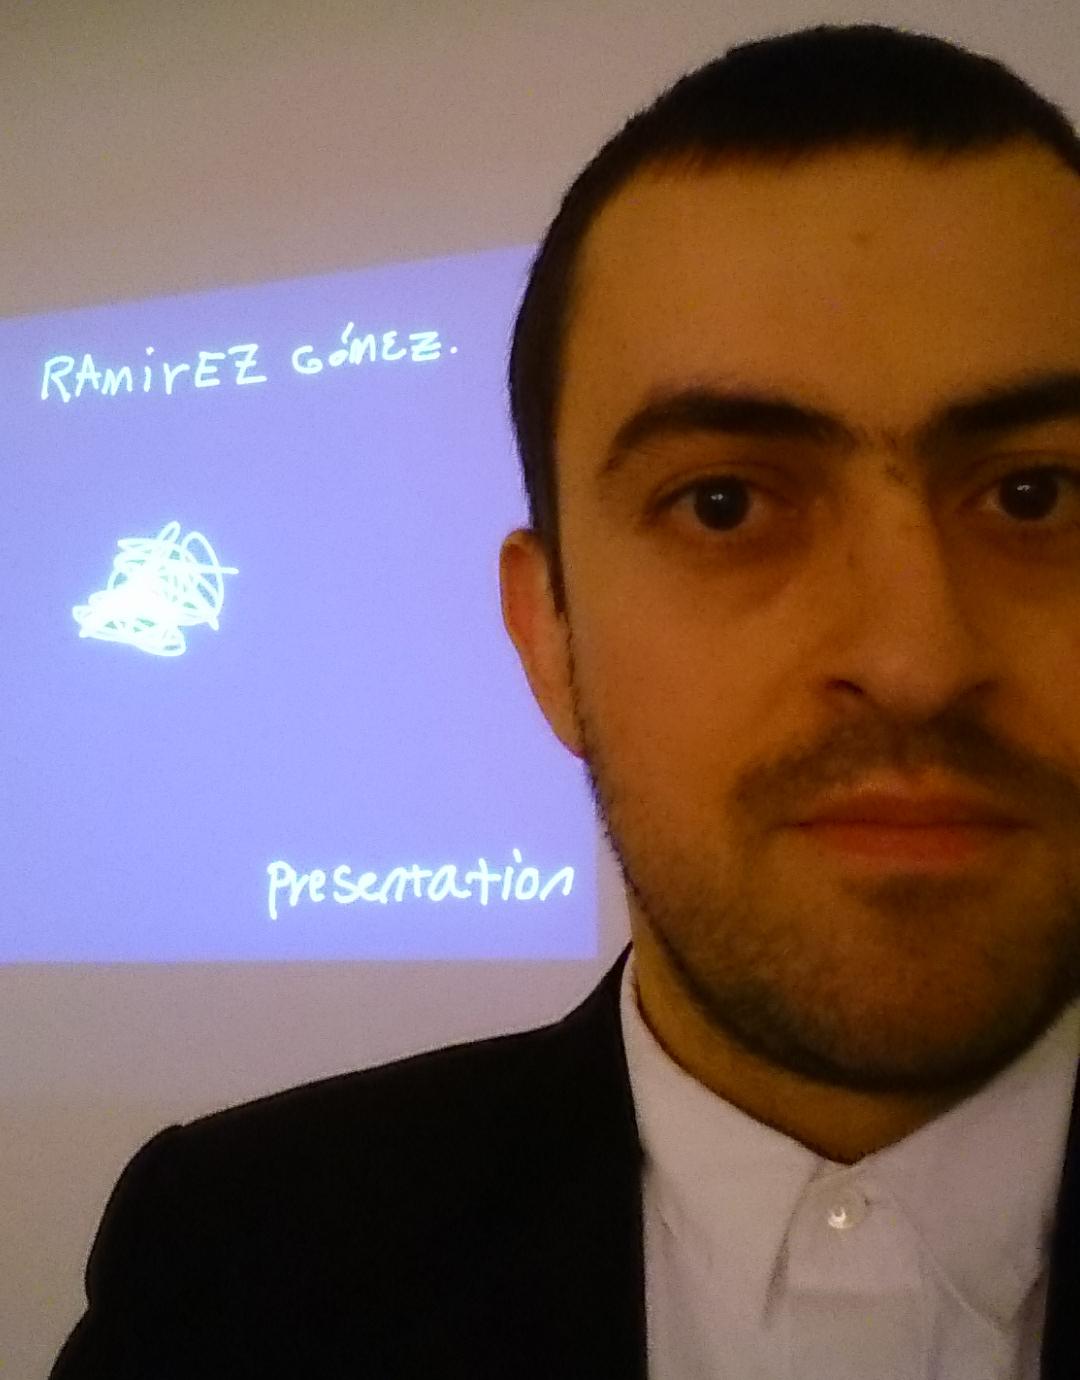 David presentation